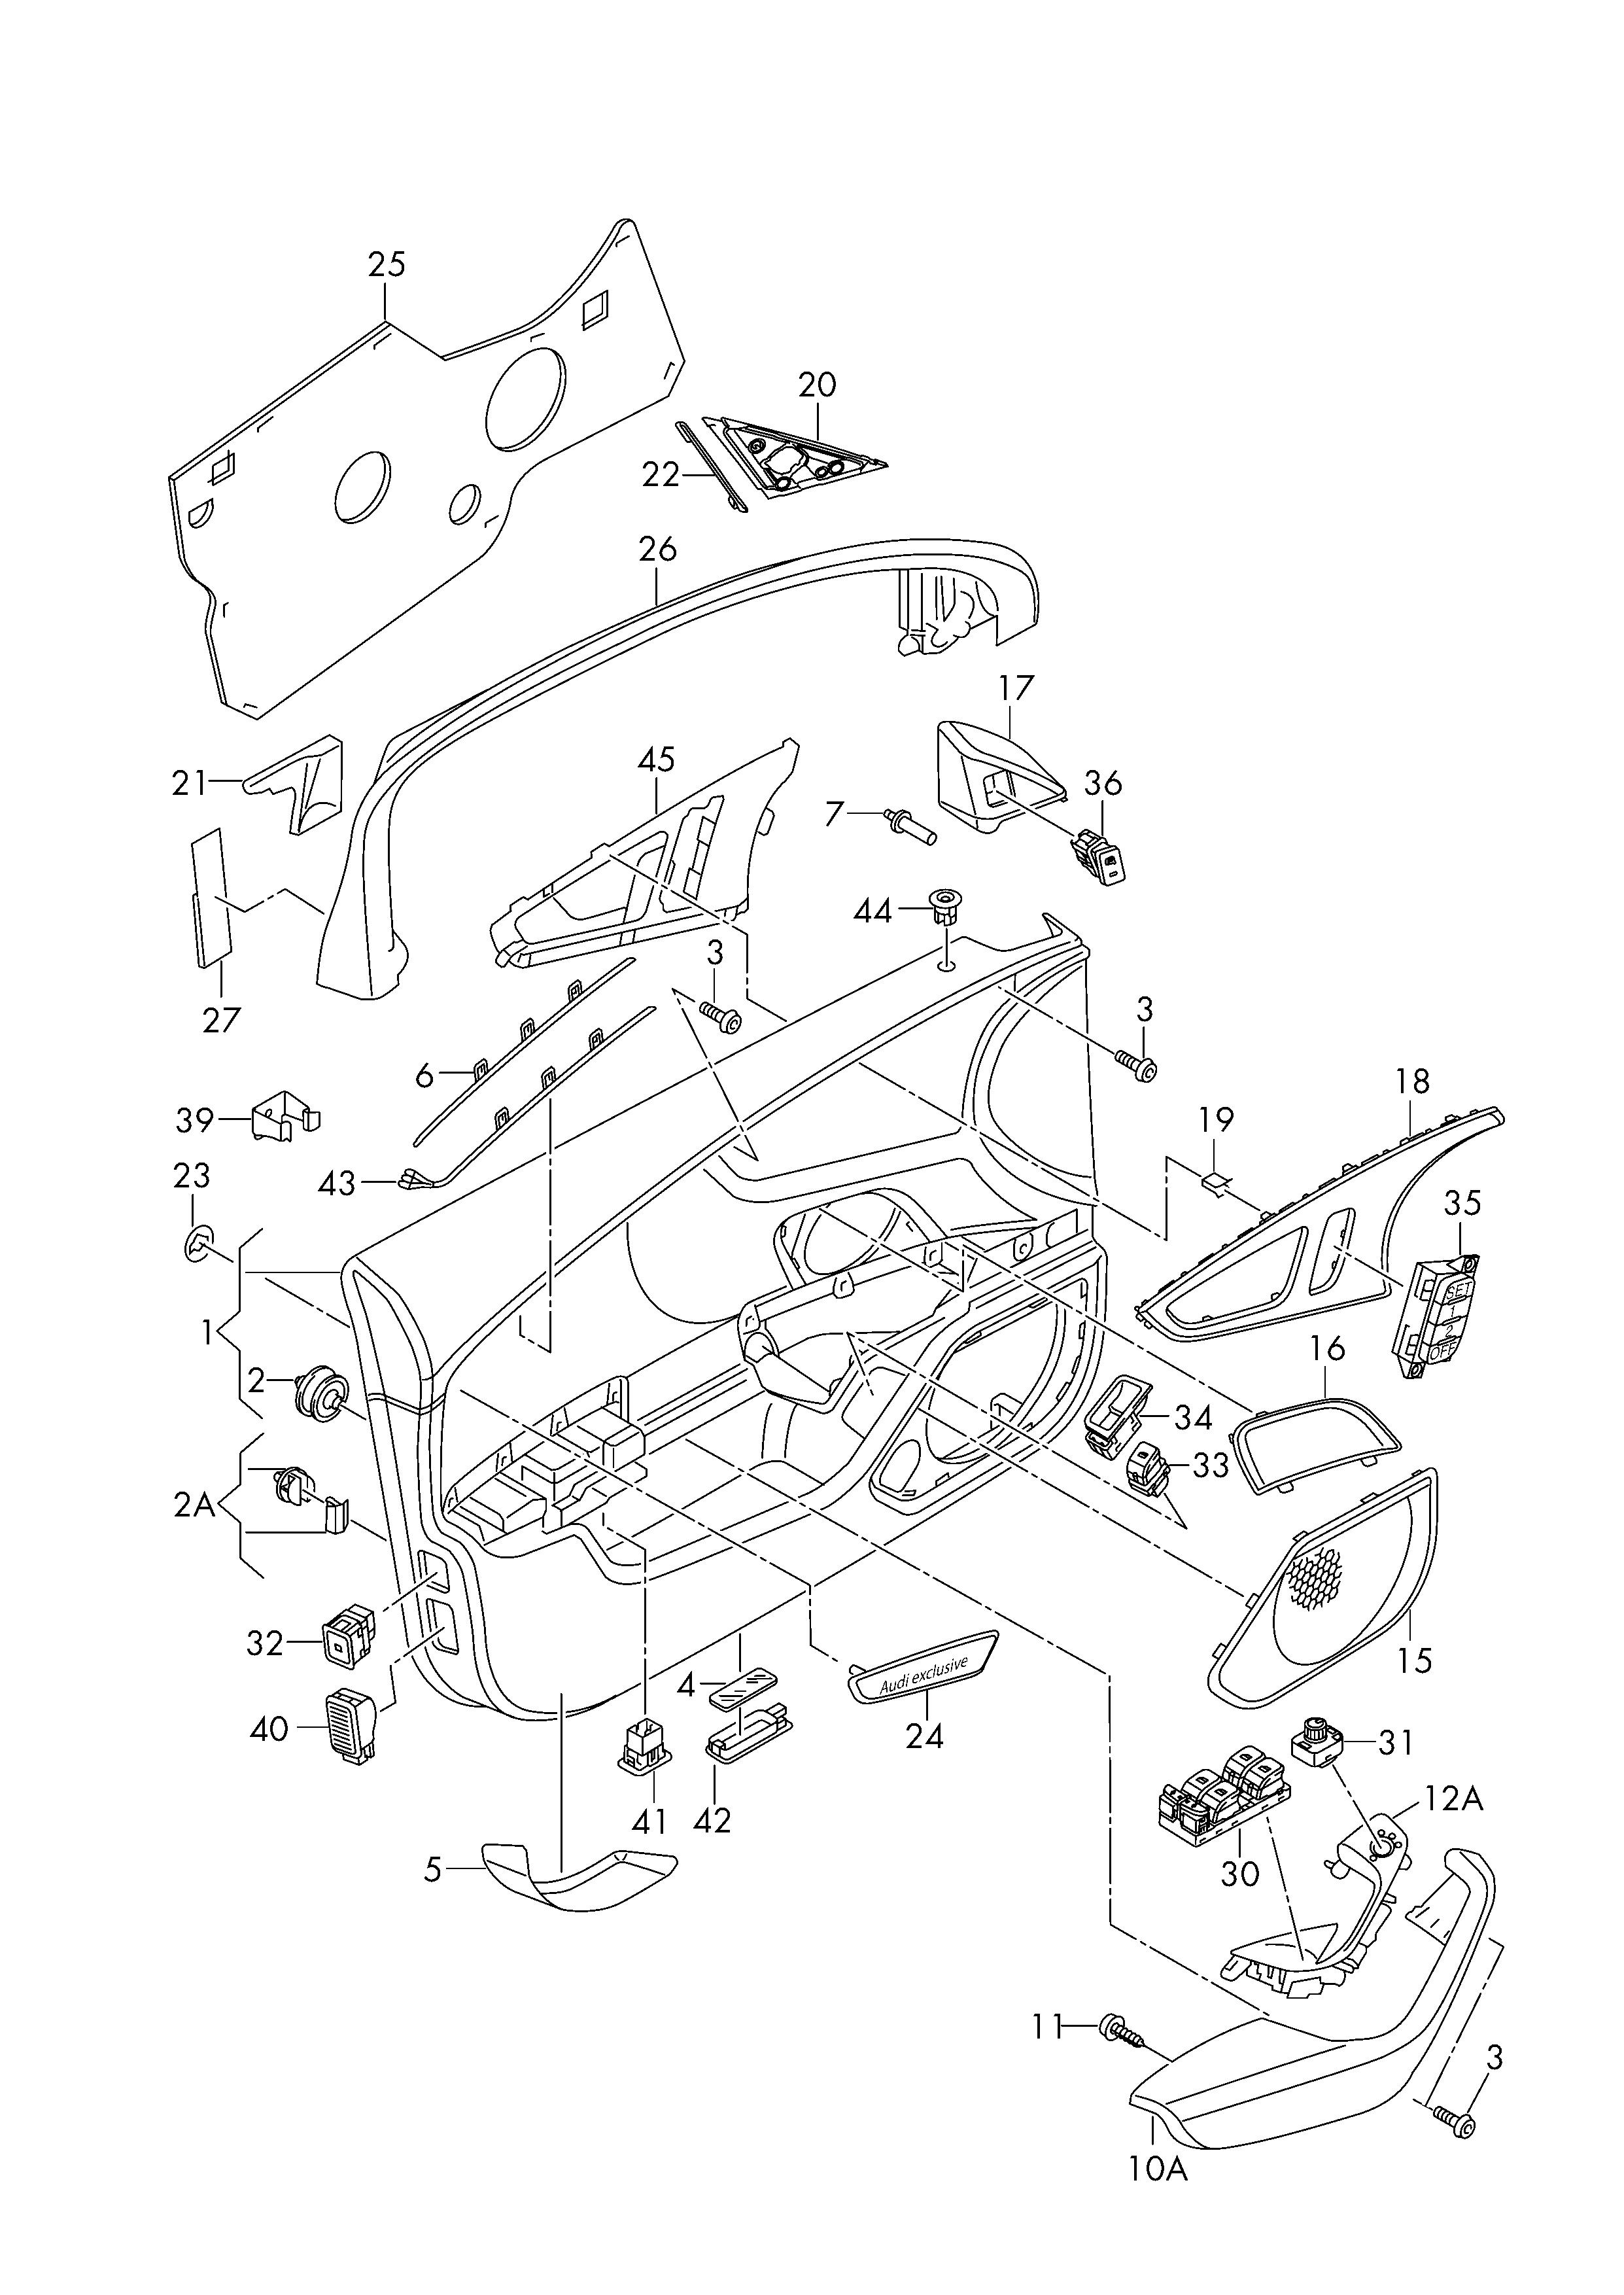 audi a6 parts diagram wiring diagram advance audi a6 c5 parts diagram [ 2483 x 3508 Pixel ]